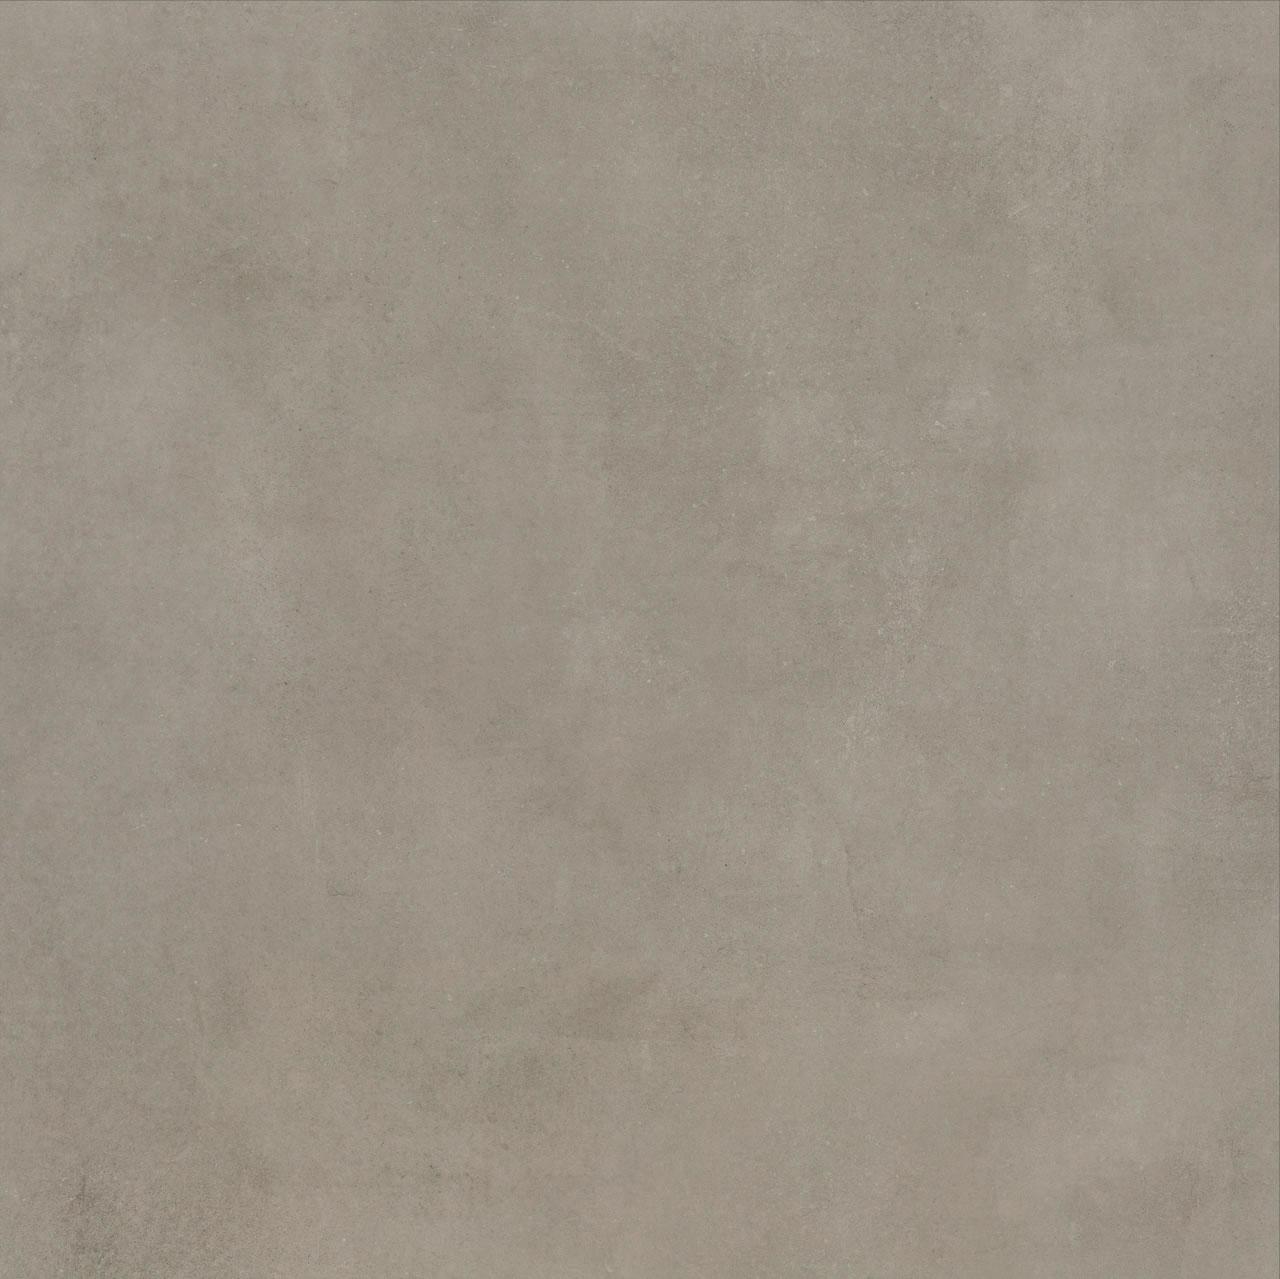 munari concreto ac 90×90